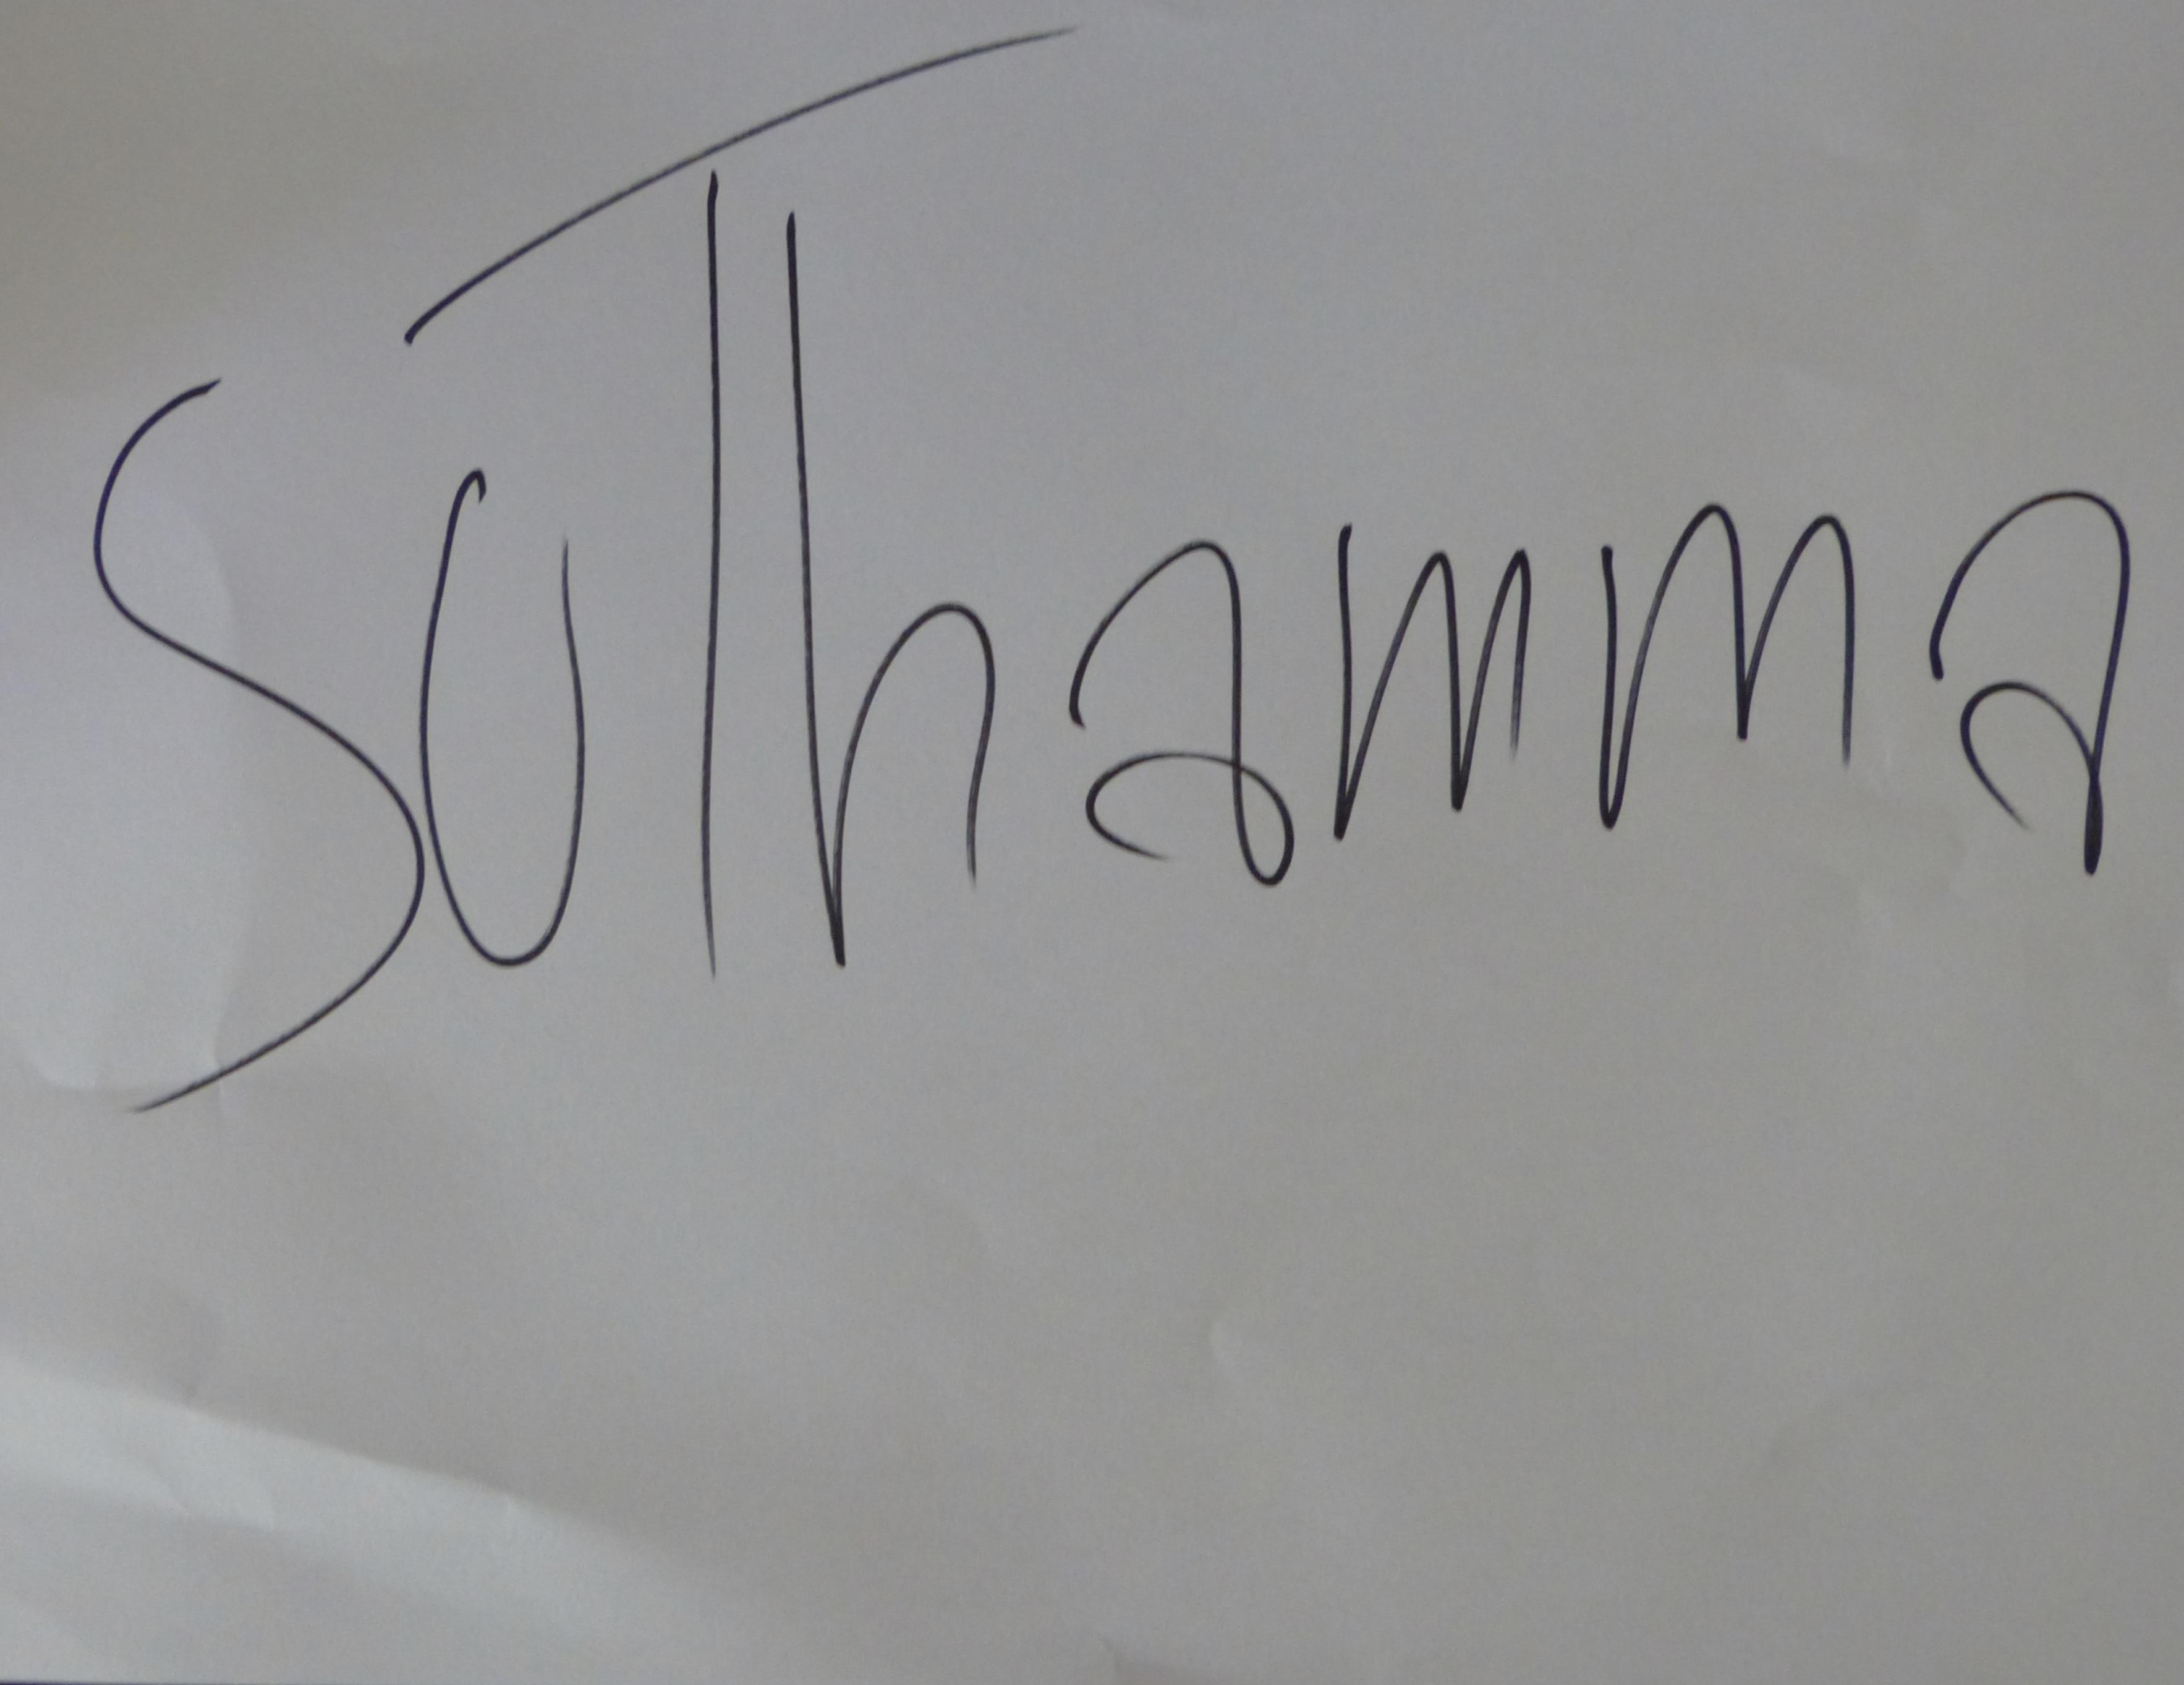 Suthamma Thimkaeo's Signature